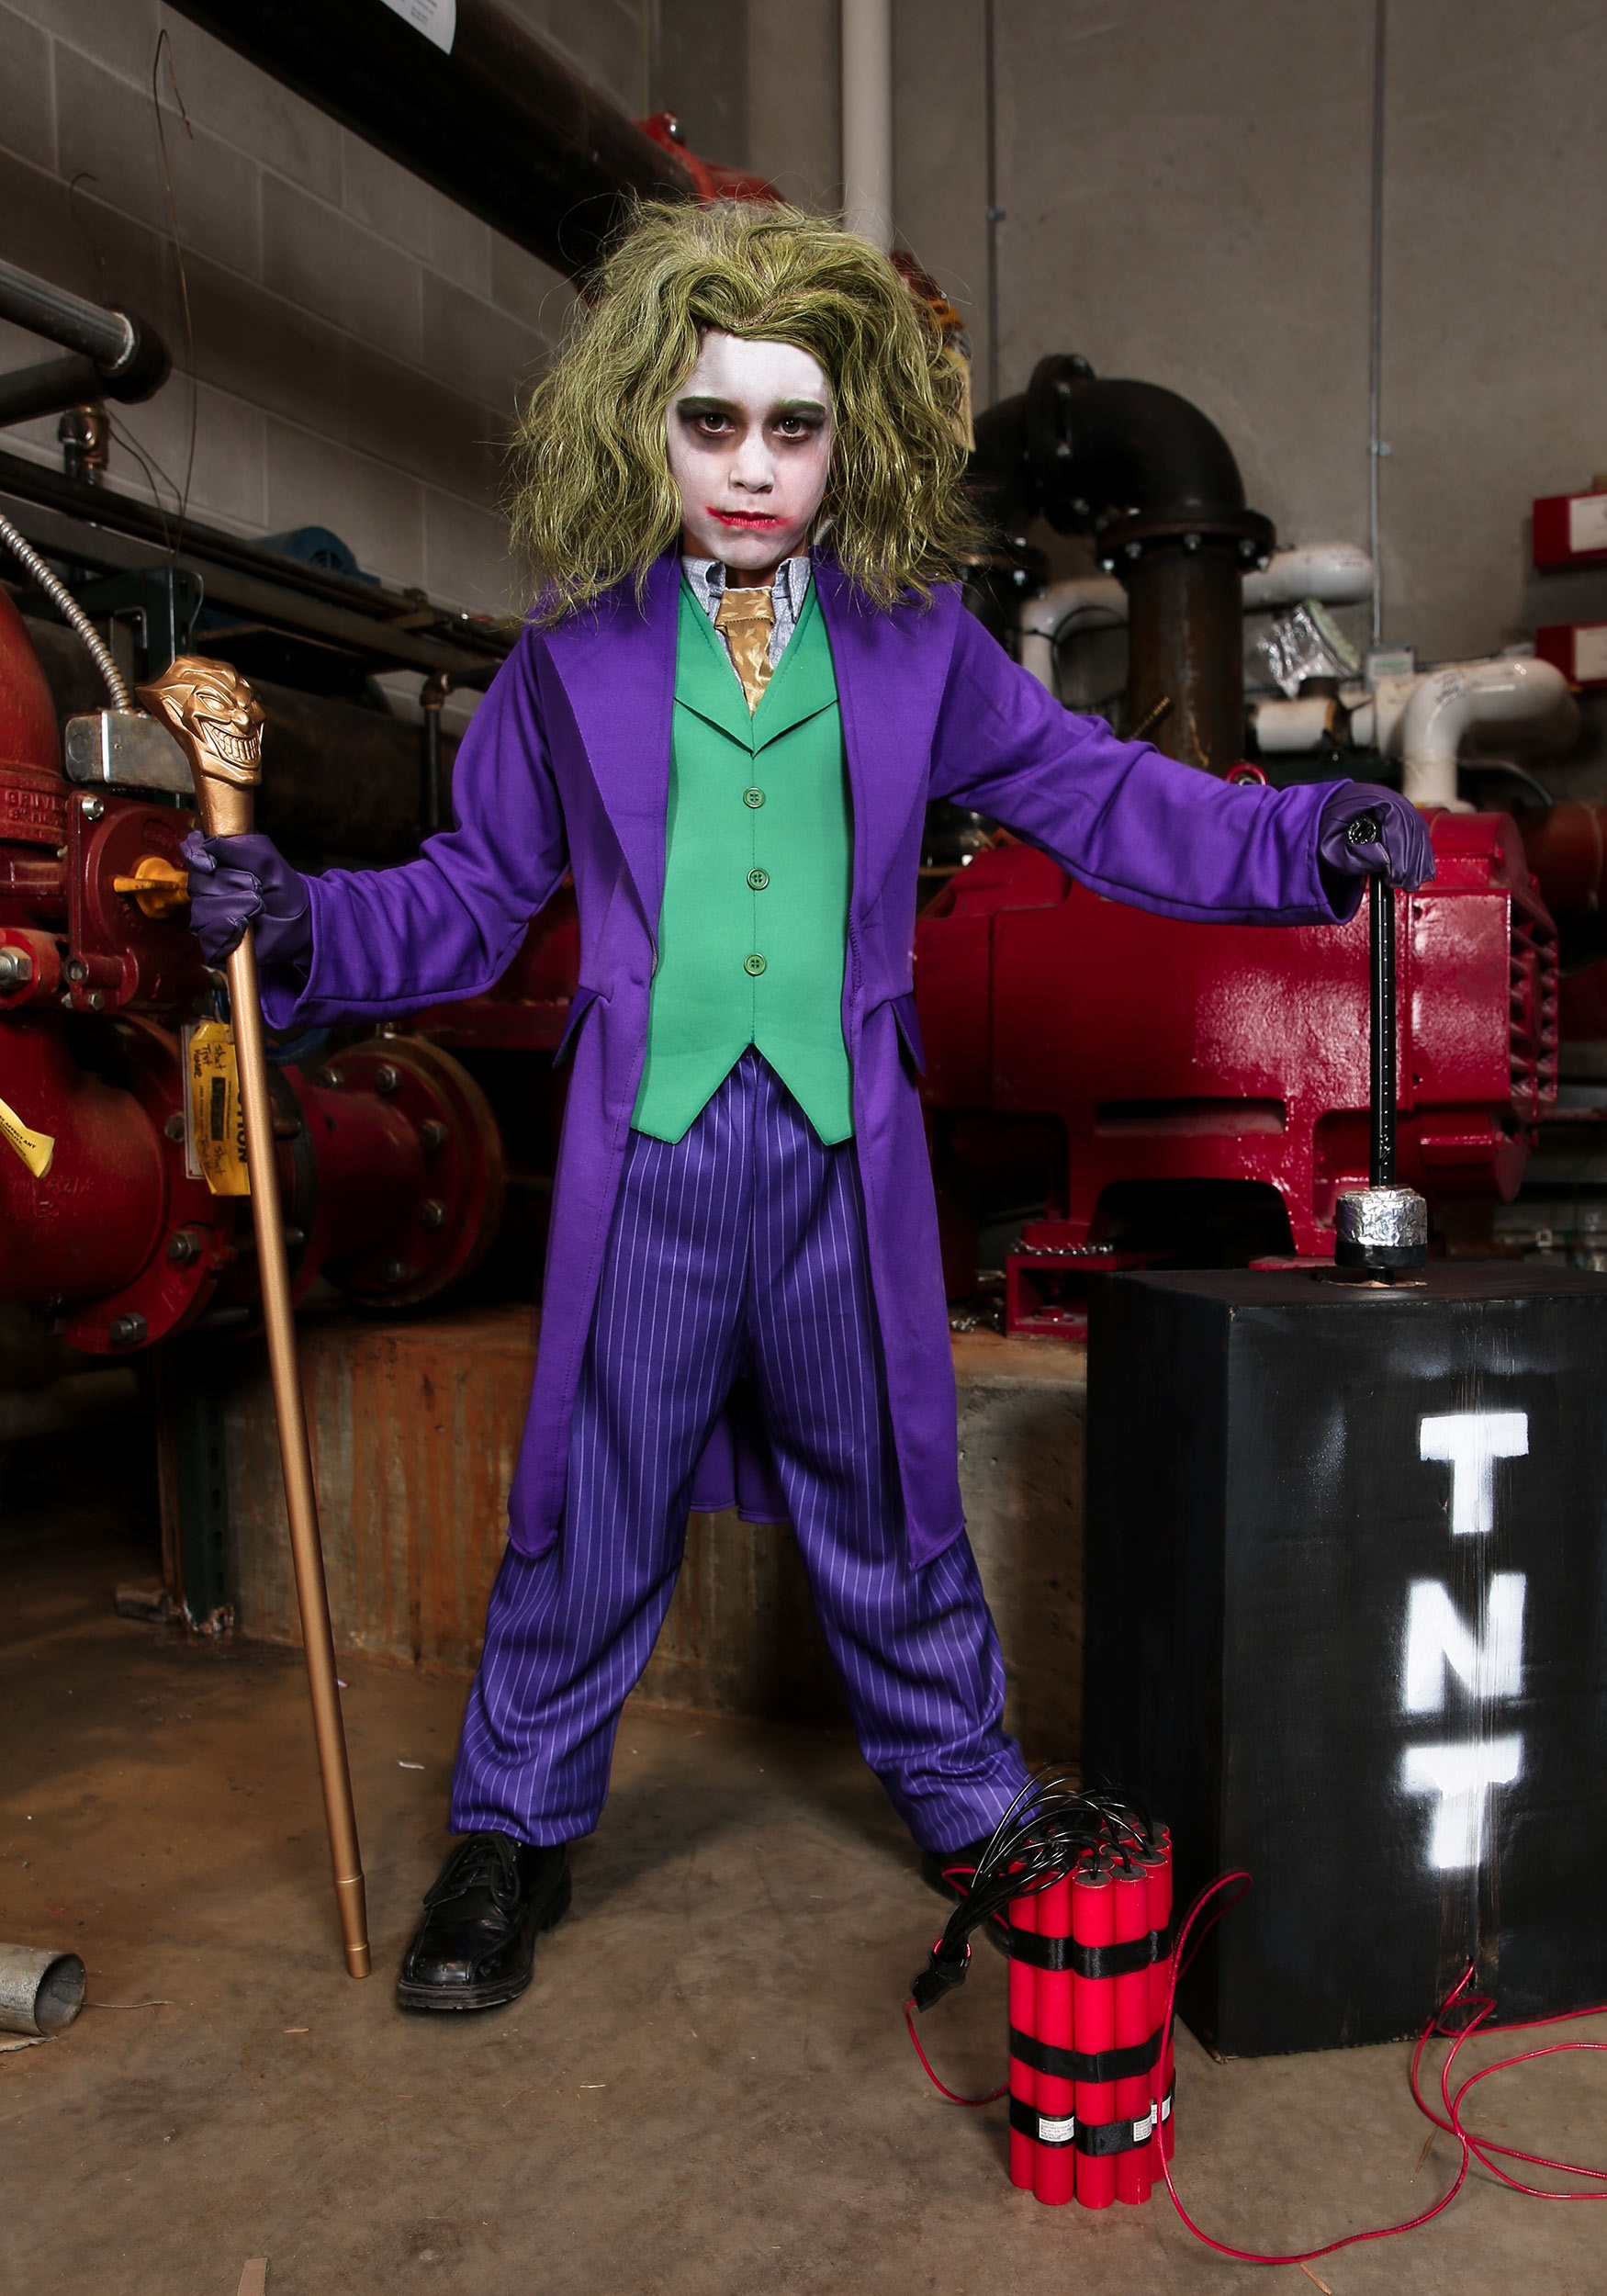 Deluxe Boys Dark Knight Joker Costume Kids Batman Joker